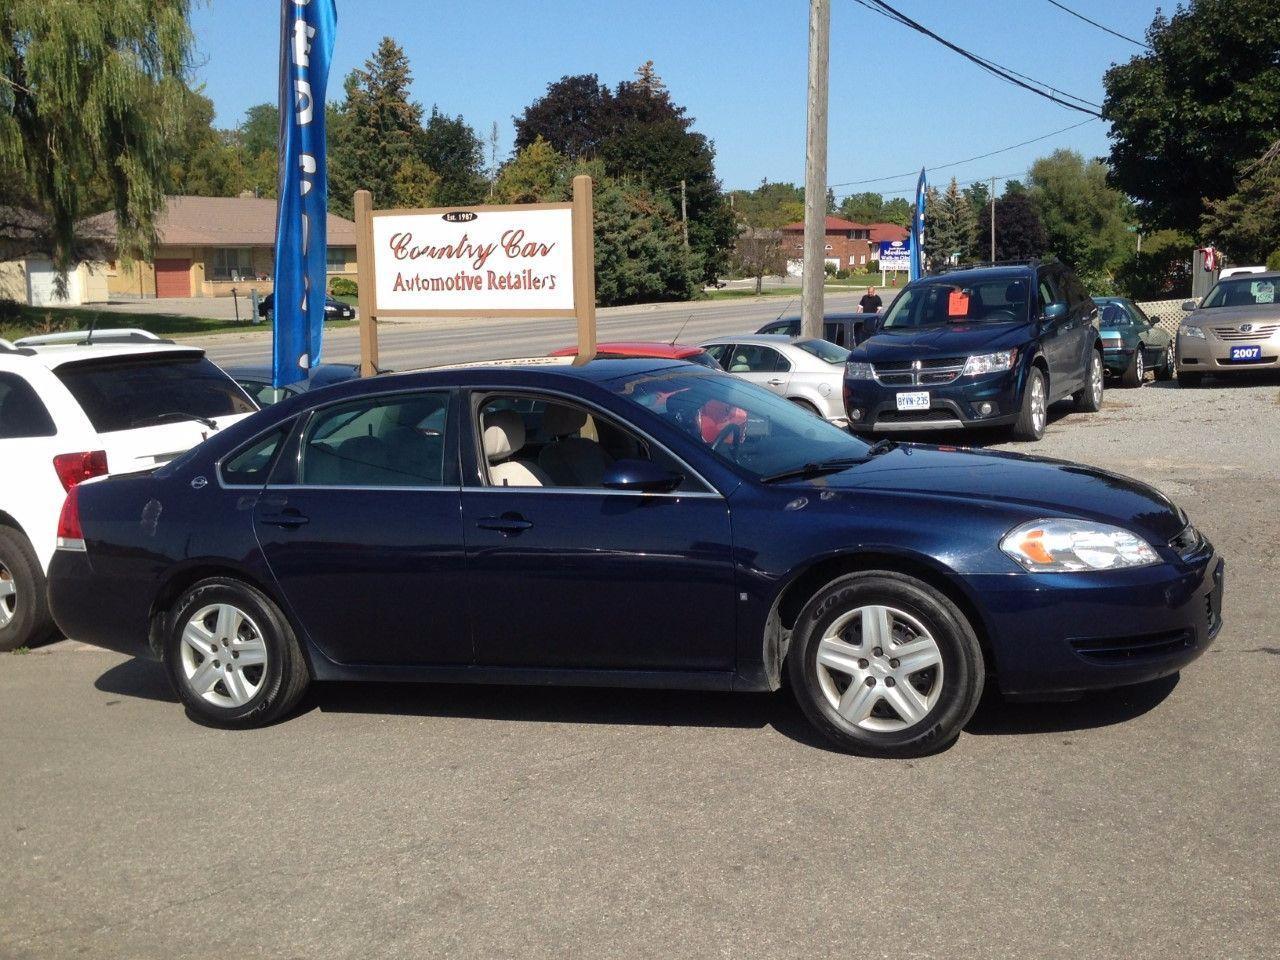 Photo of Blue 2008 Chevrolet Impala